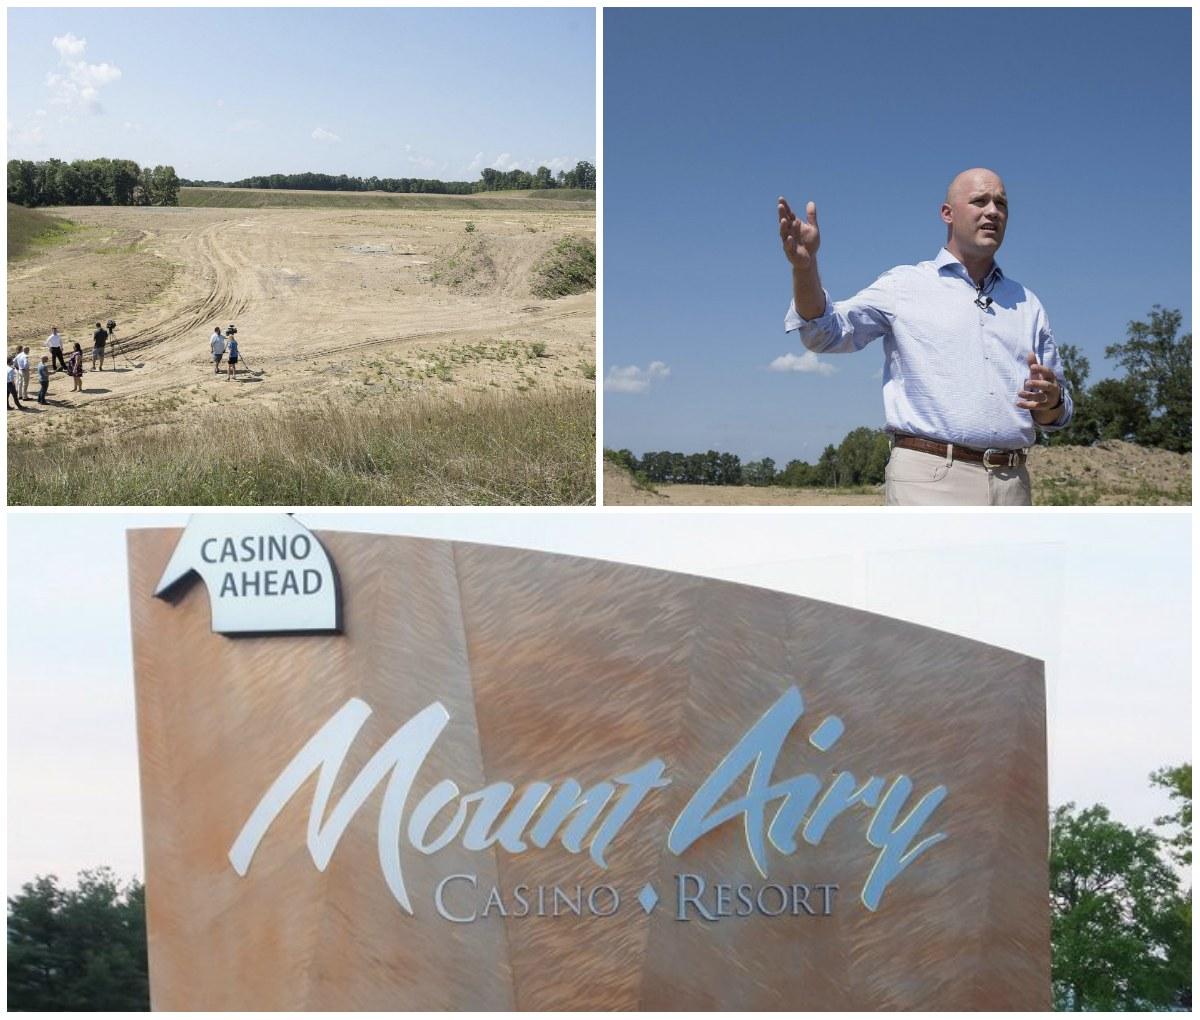 Mount Airy Casino Pennsylvania satellite